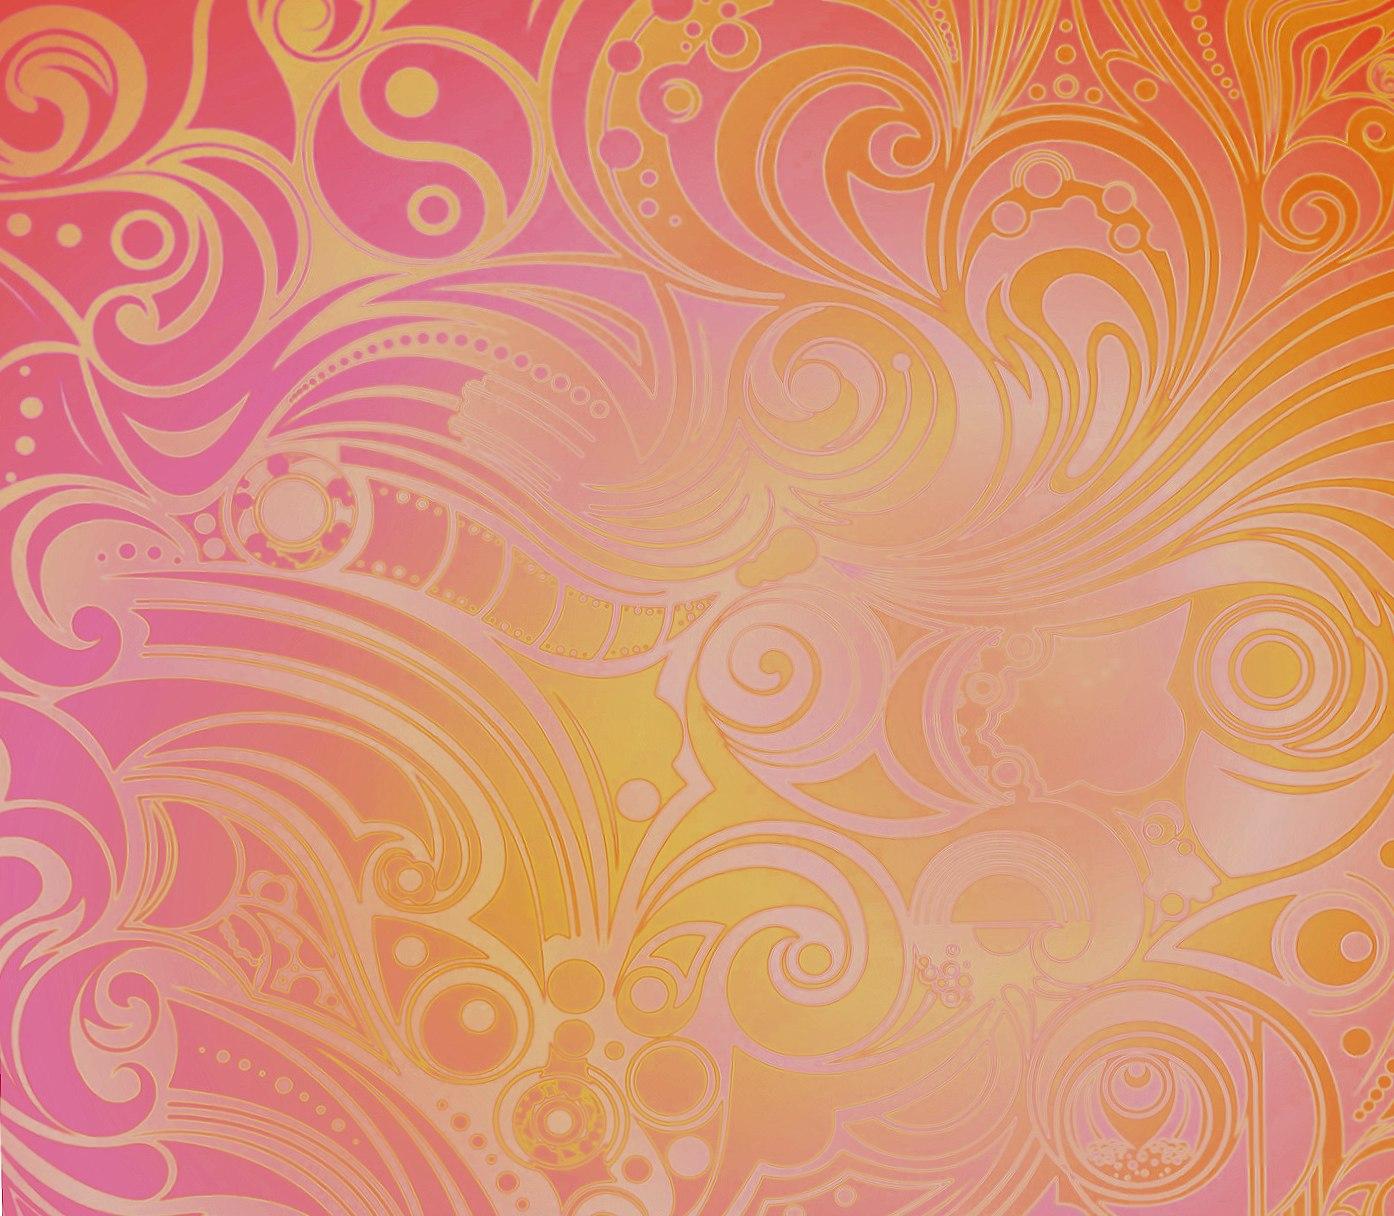 WONDERFULL-001 wallpapers HD quality